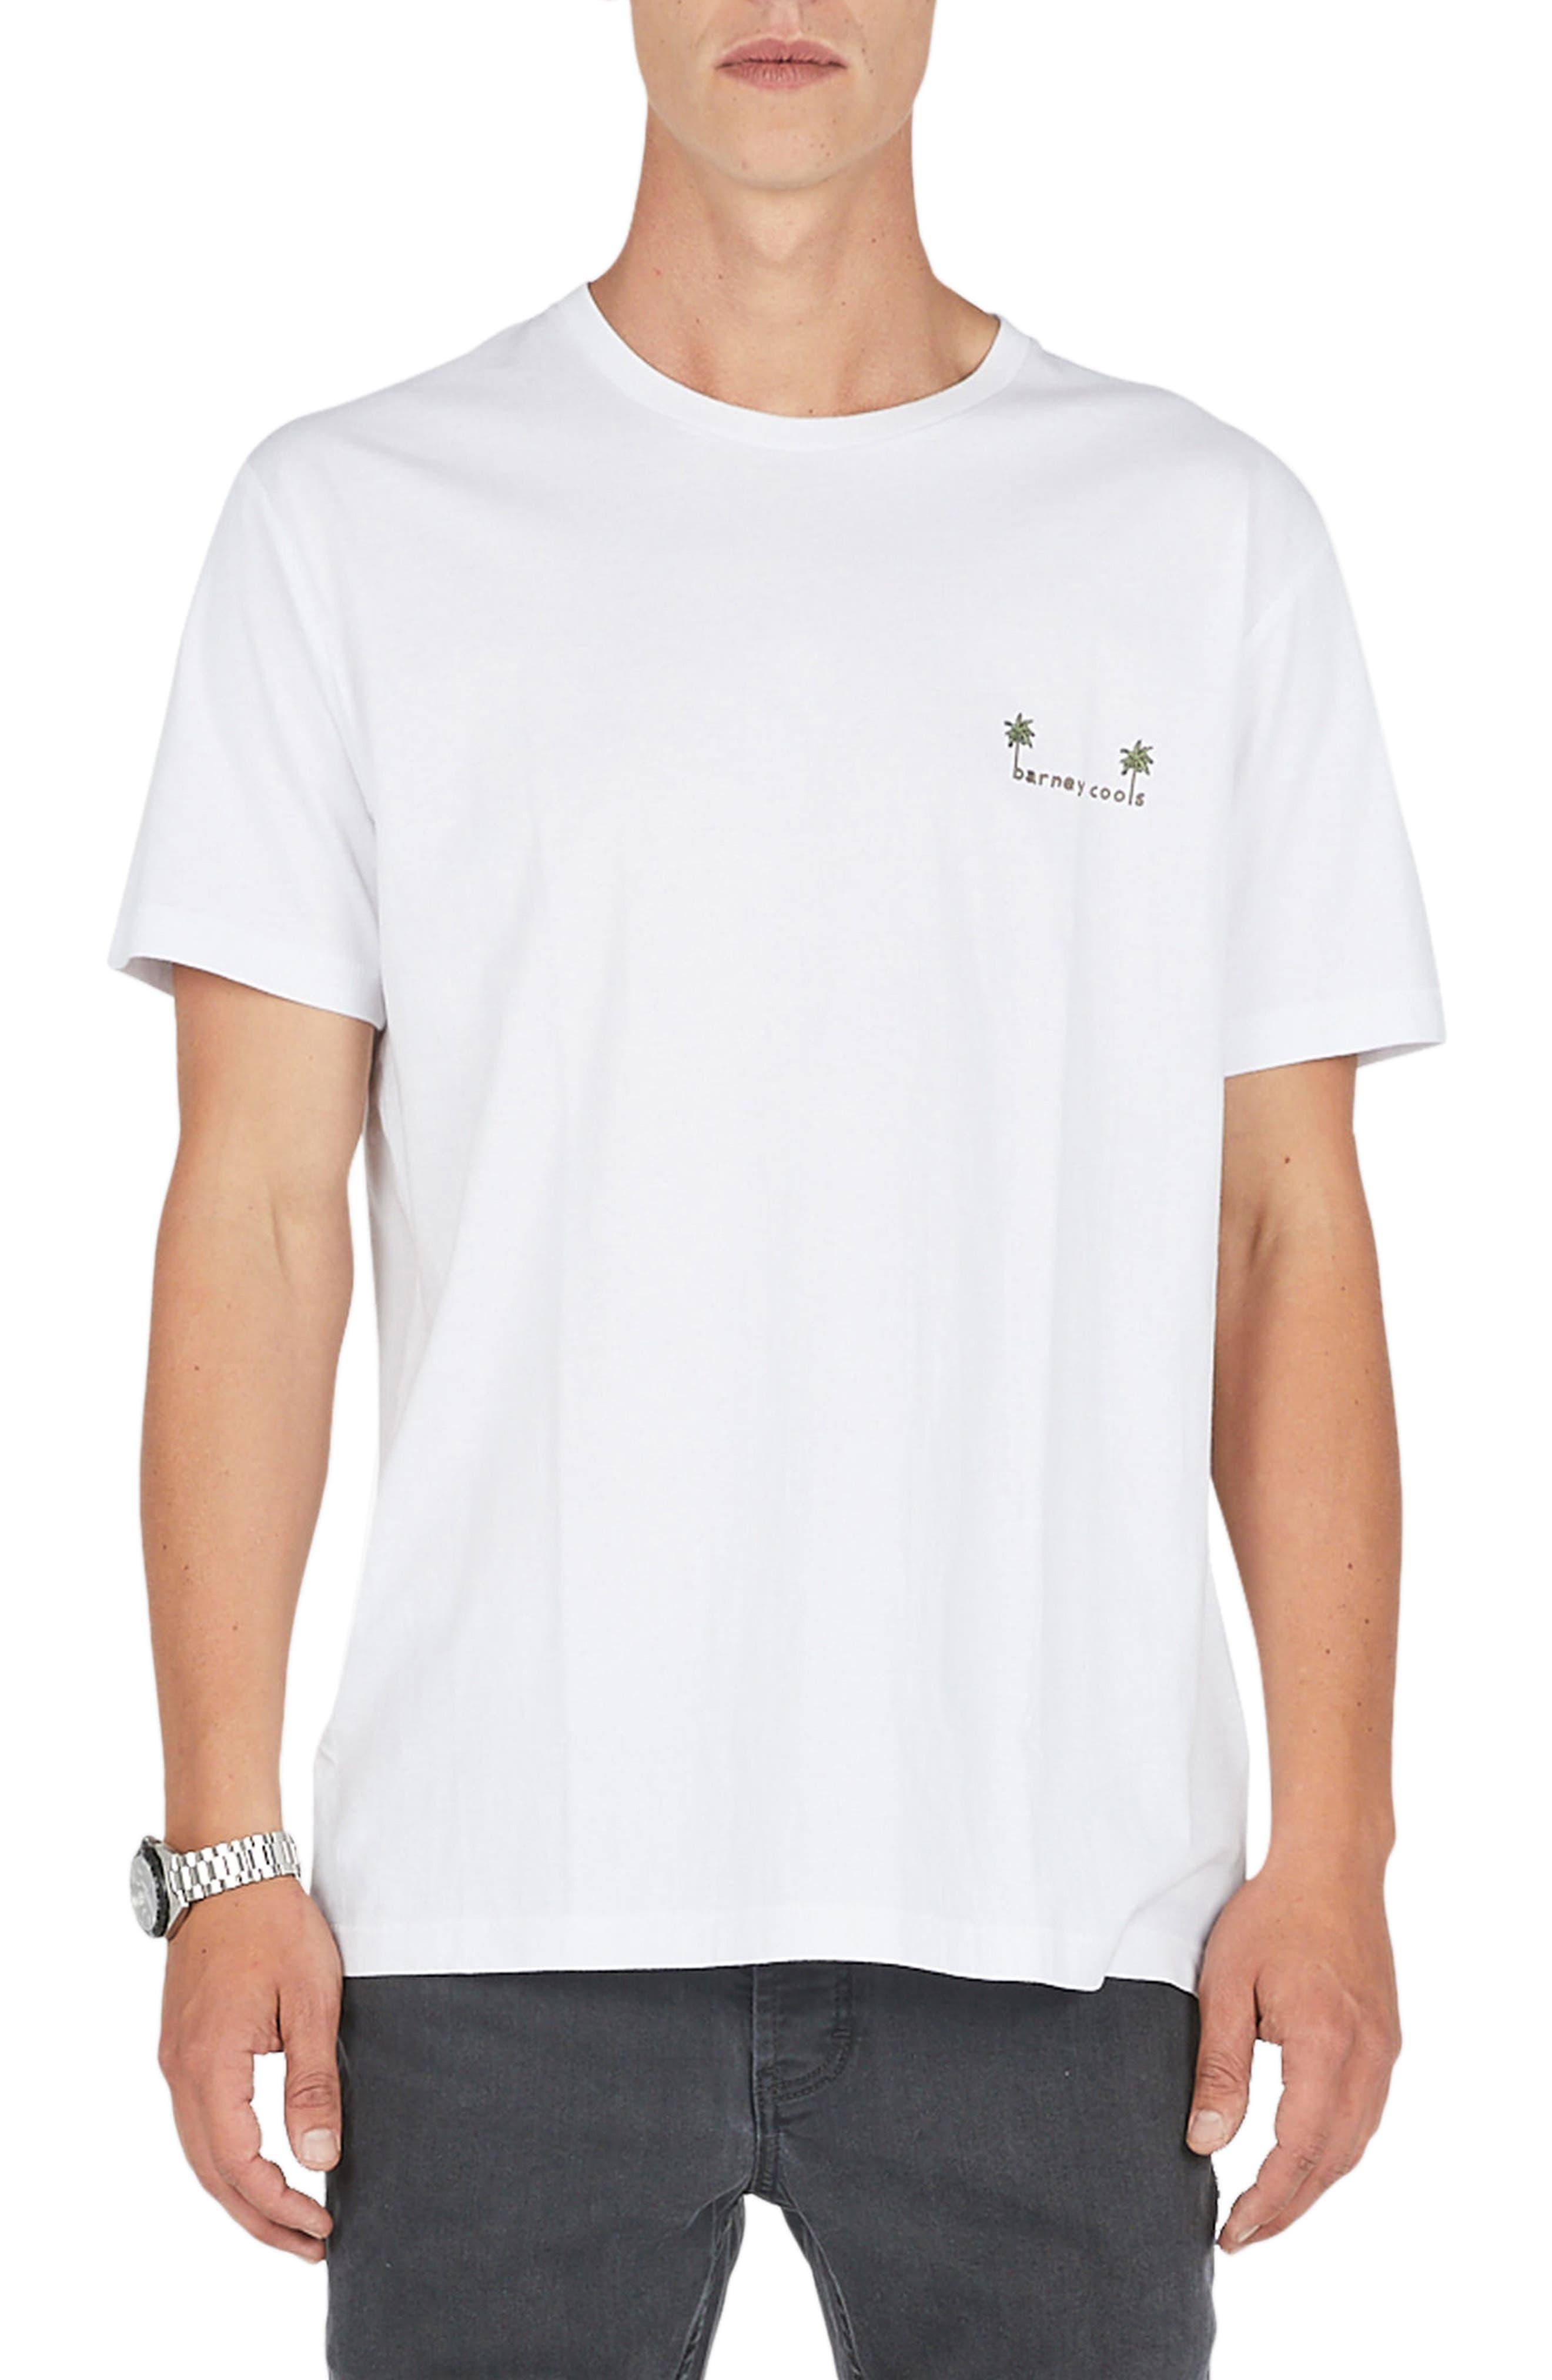 Life's Tough T-Shirt,                         Main,                         color, 100